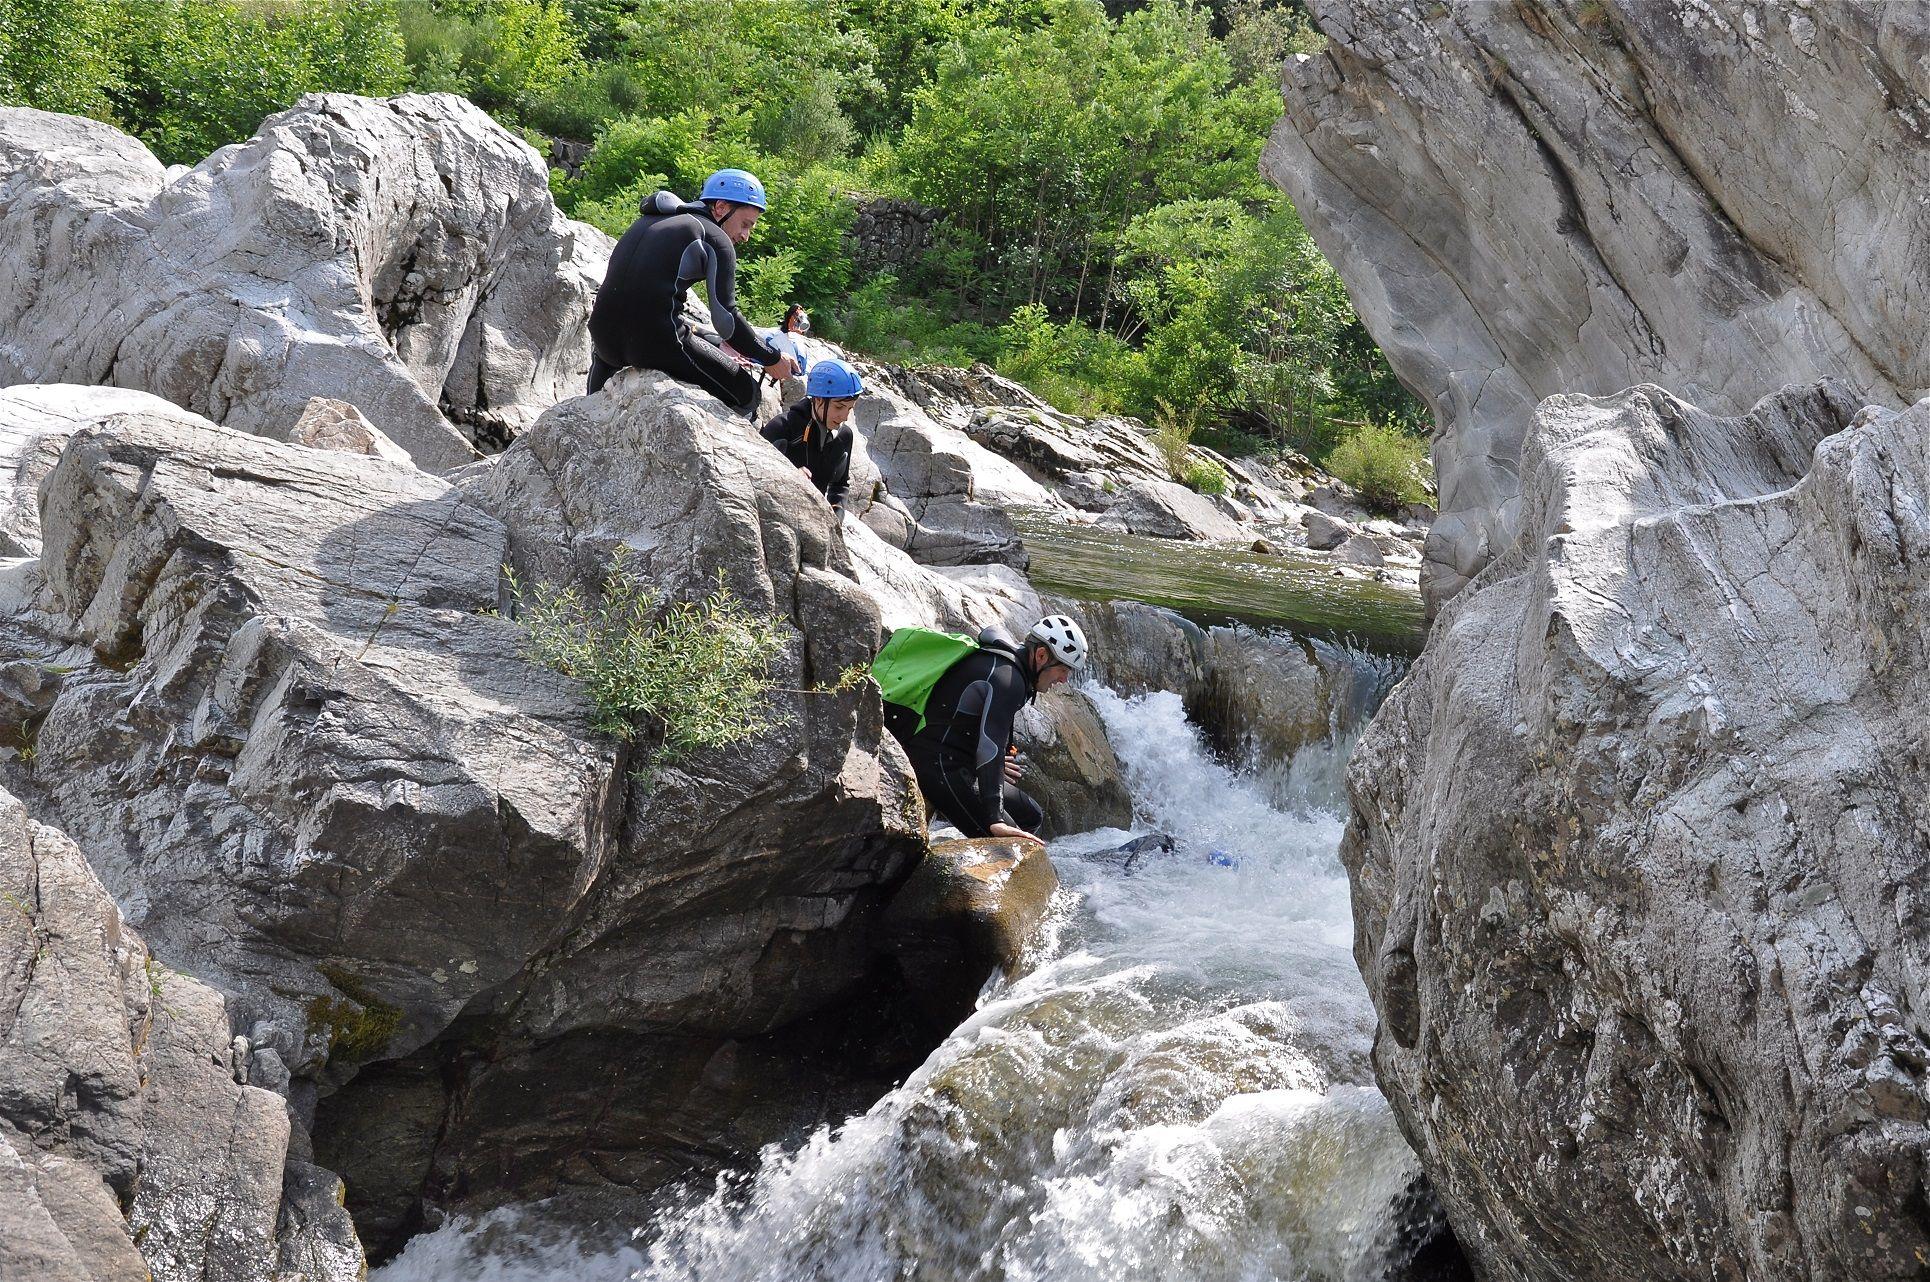 cevennes canyoning millau aveyron lozere midi pyrénées occitanie sud ouest pack multi activités via ferrata liaucous